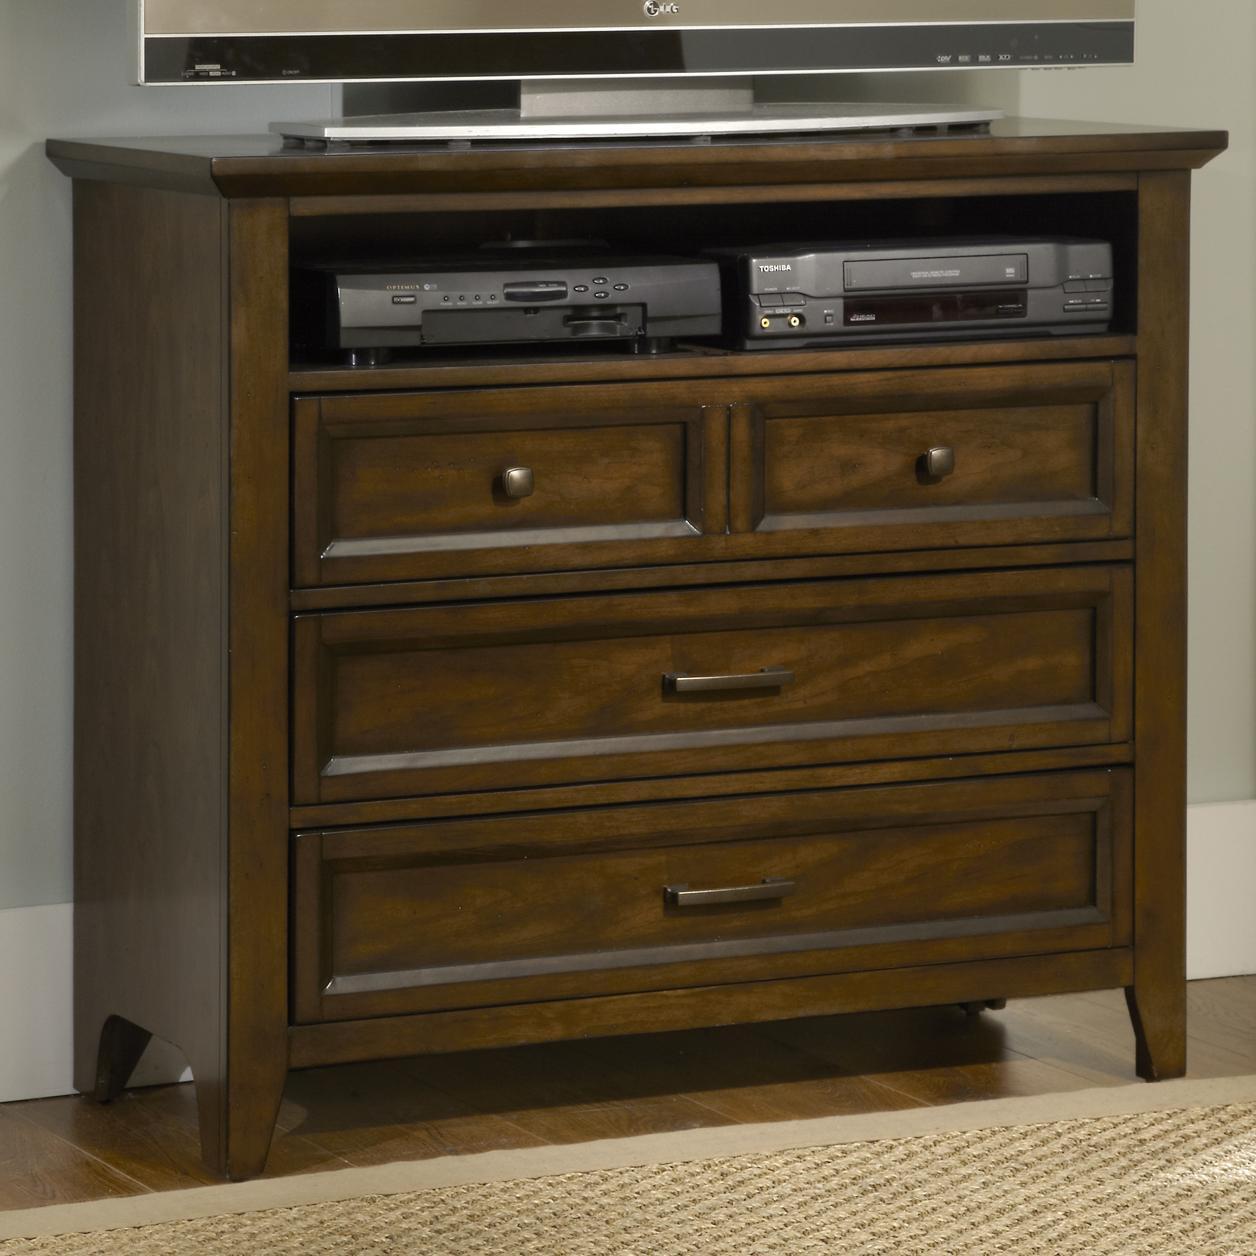 Liberty Furniture Laurel Creek Media Chest - Item Number: 461-BR45